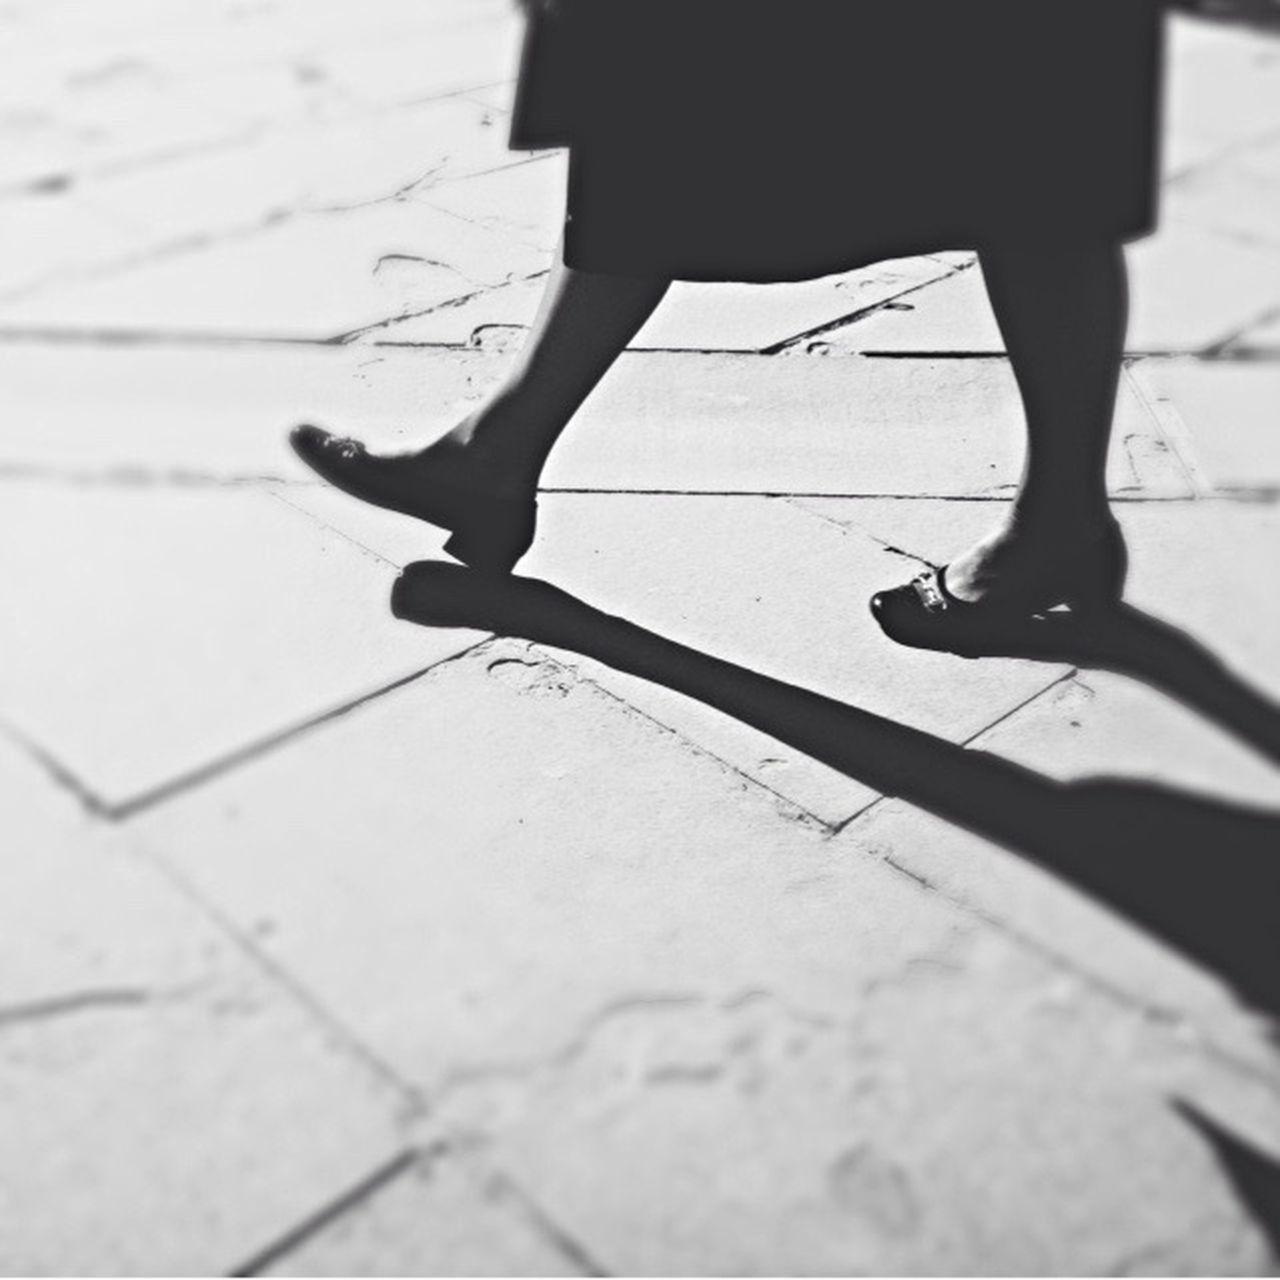 Nonna. Blackandwhite Monochrome Photography Piazza Unità Walking Sittingwaitingwishing